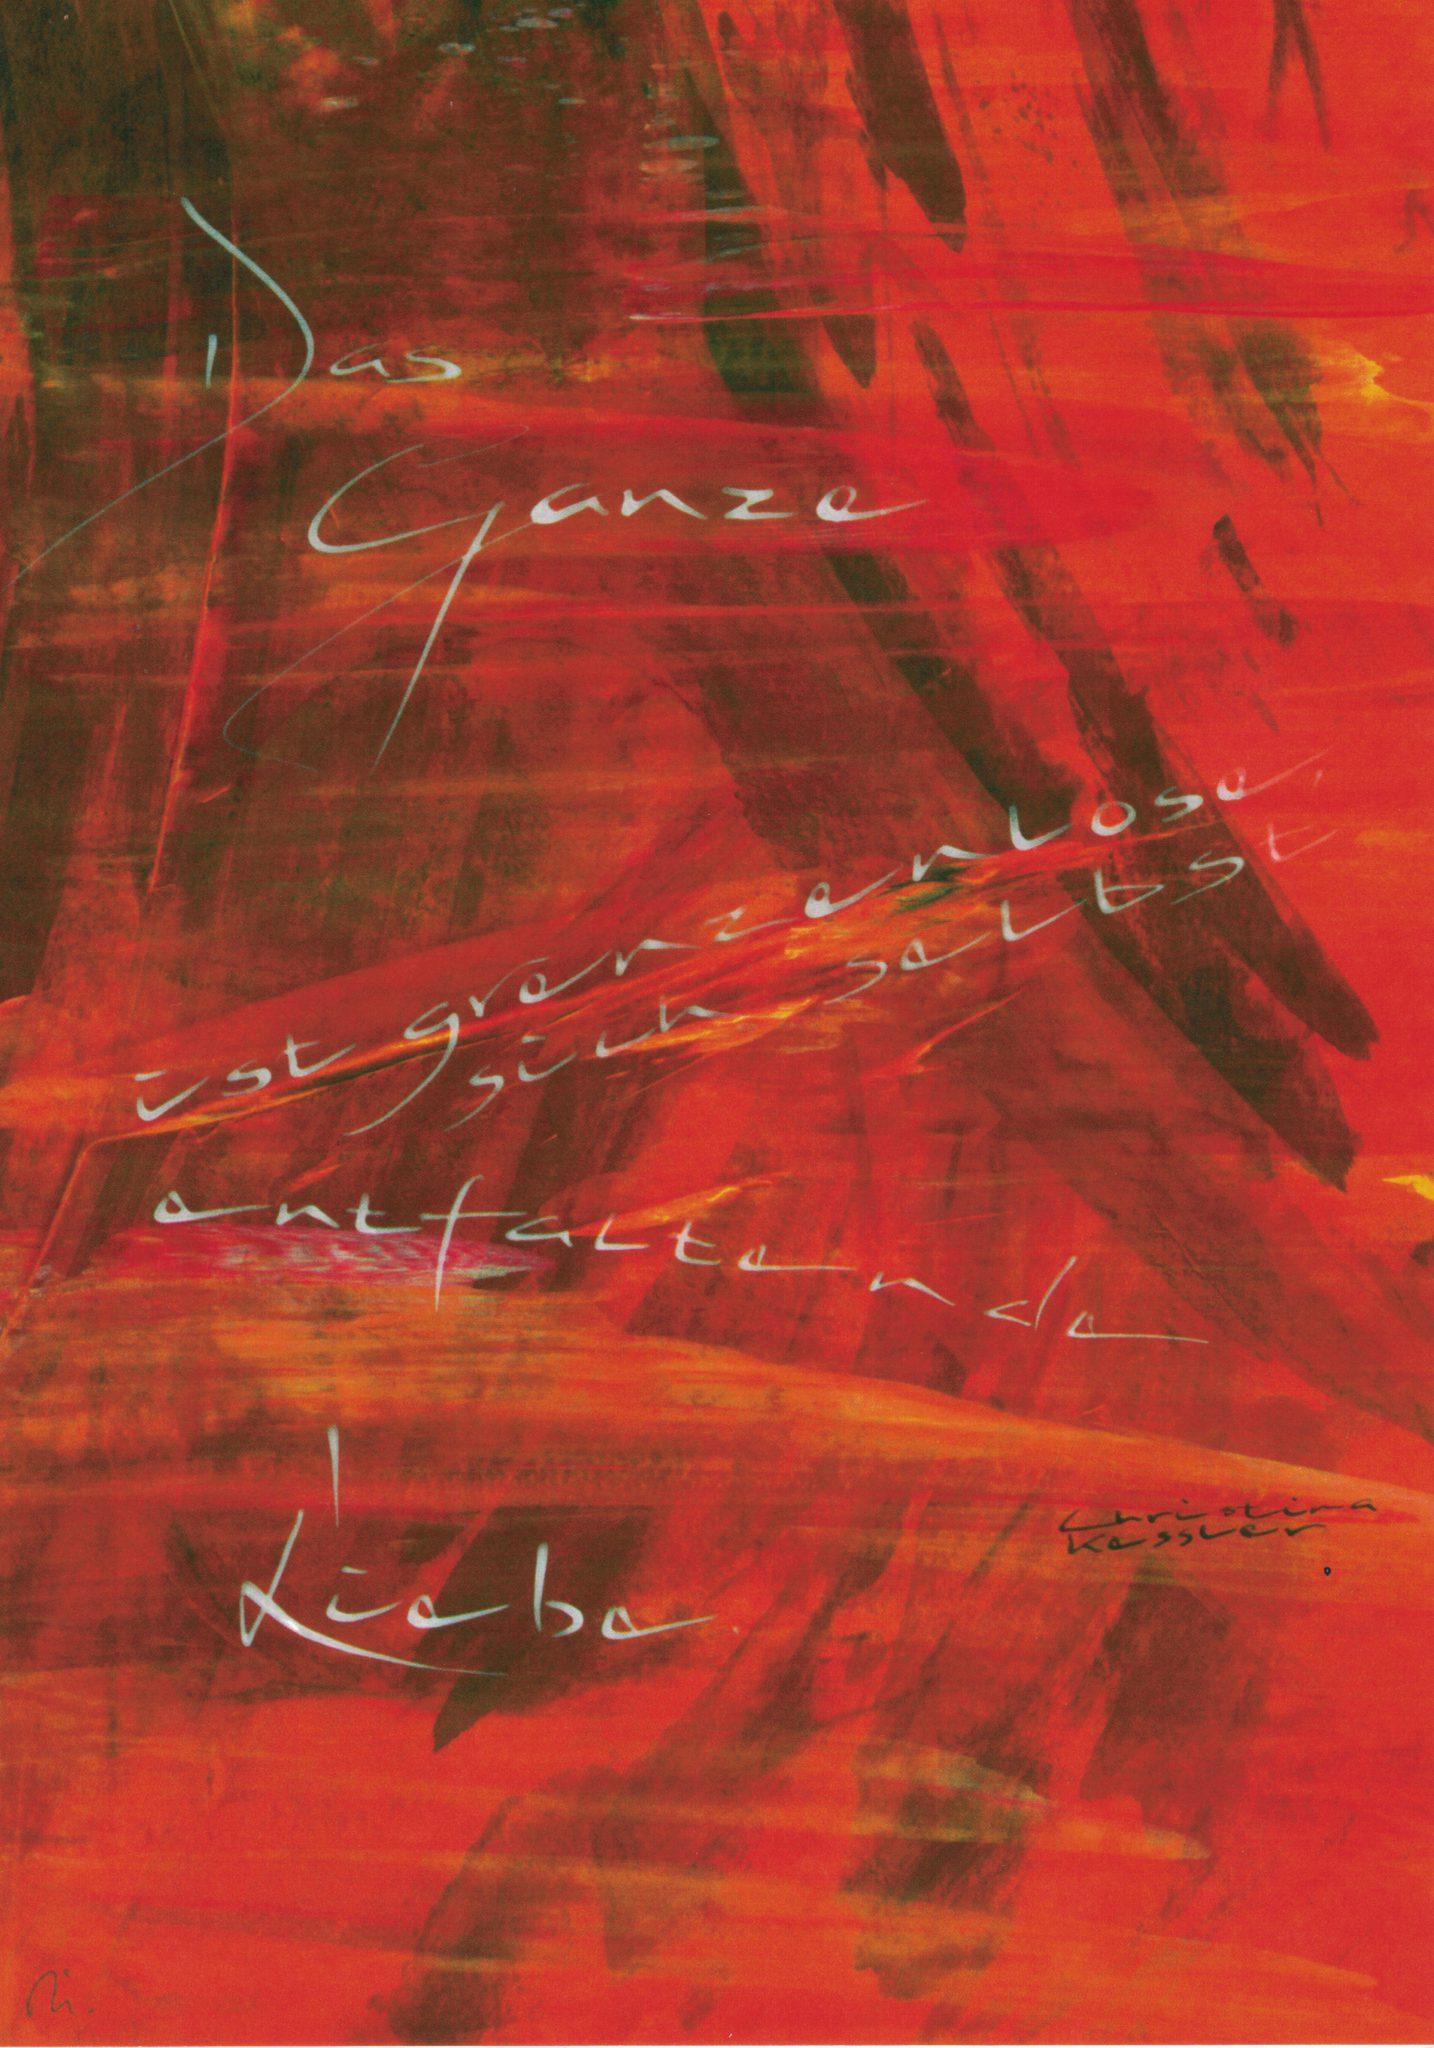 Karte 2 Christina Kessler - Alles ist 1